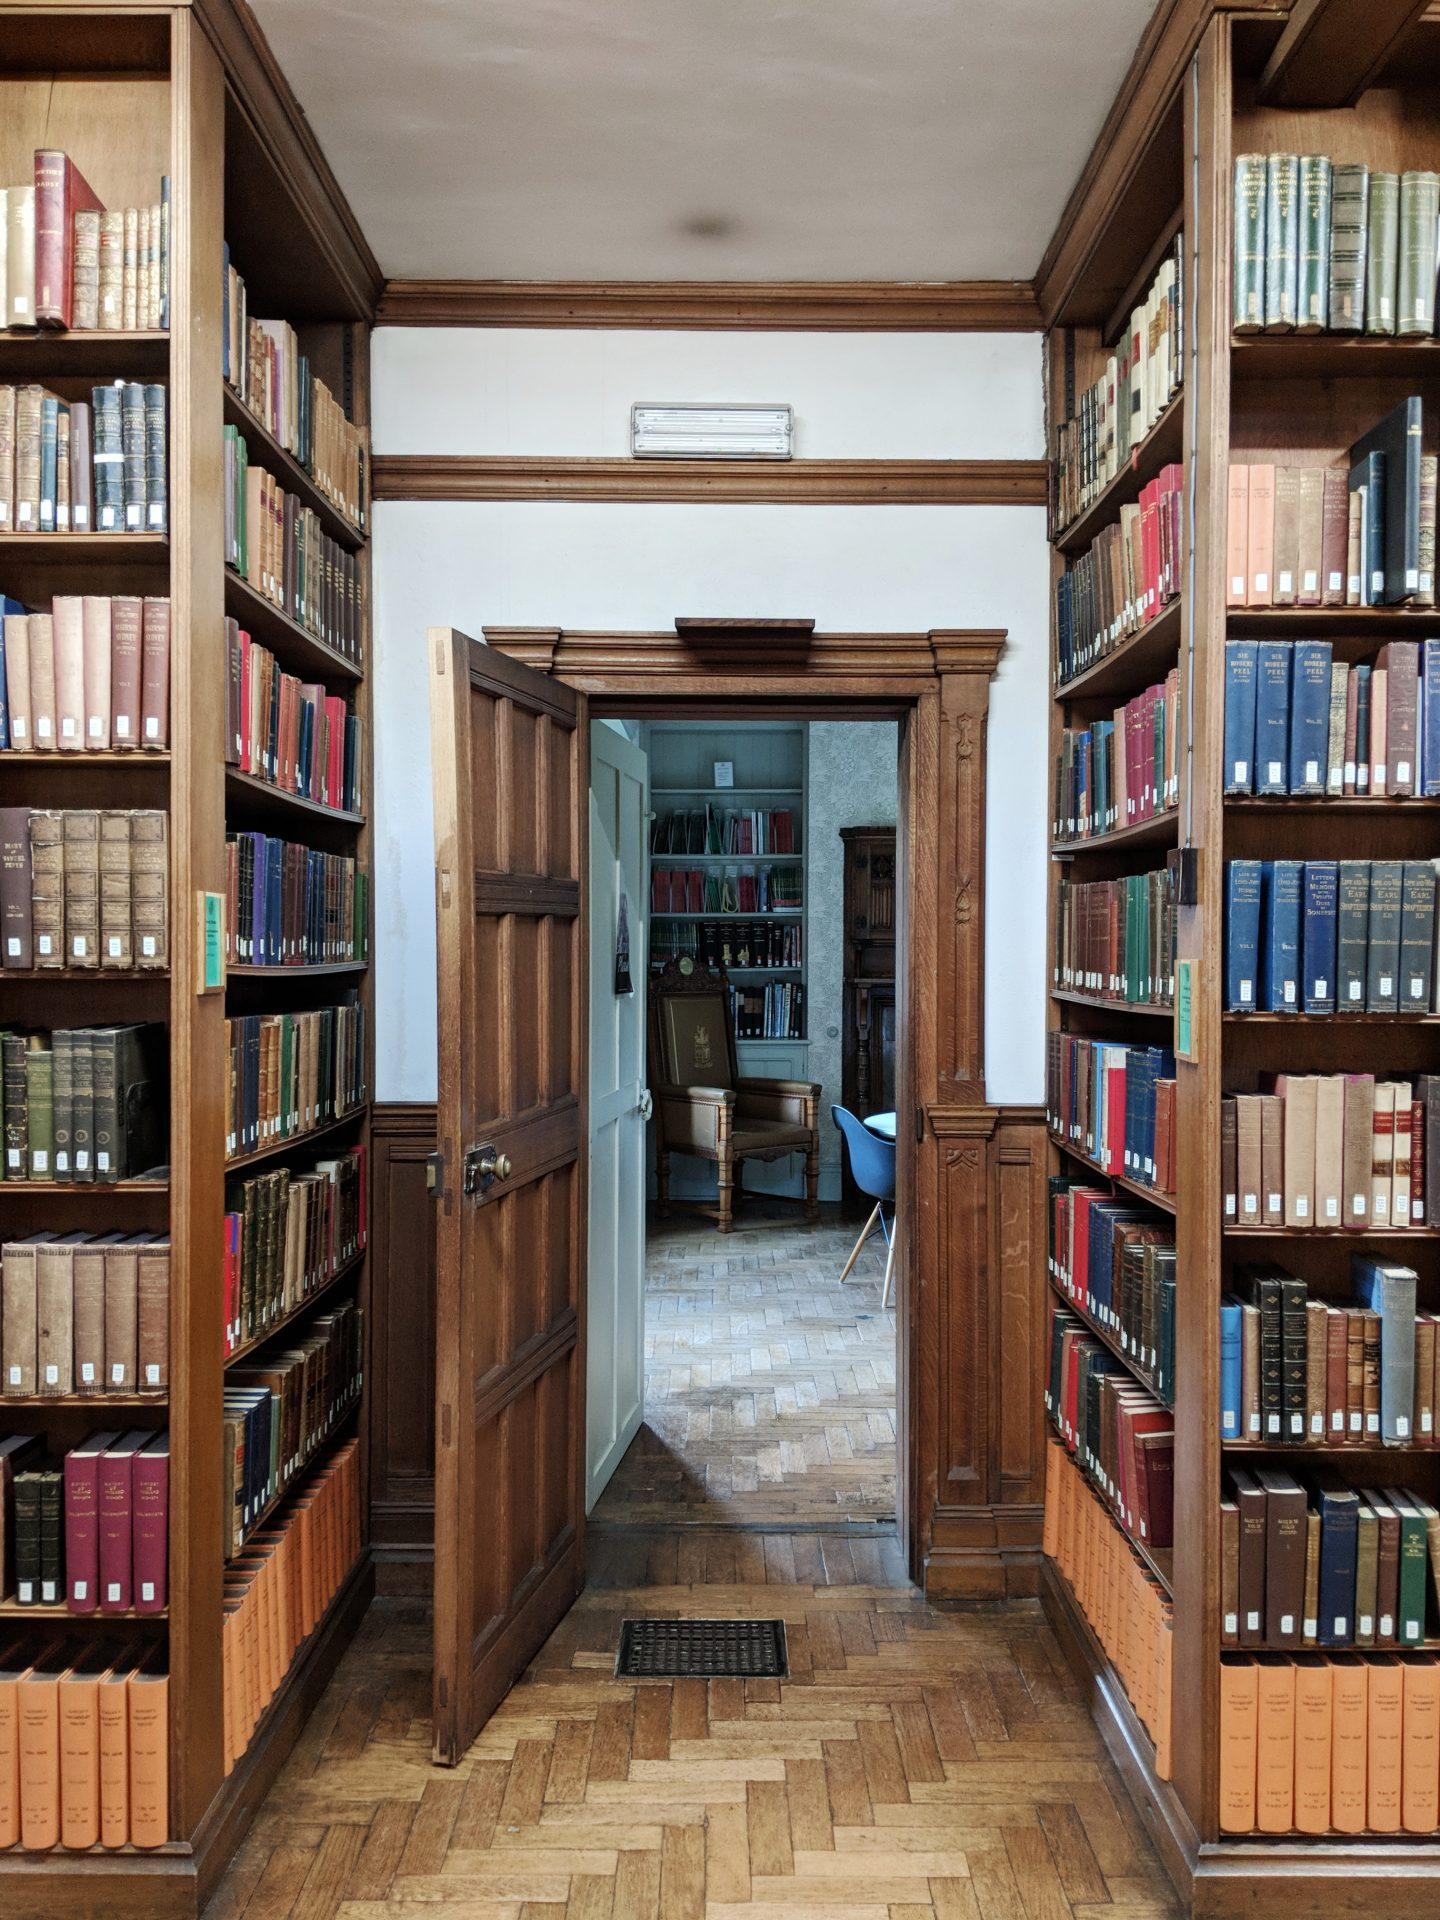 Bookshelves at Gladstones Library